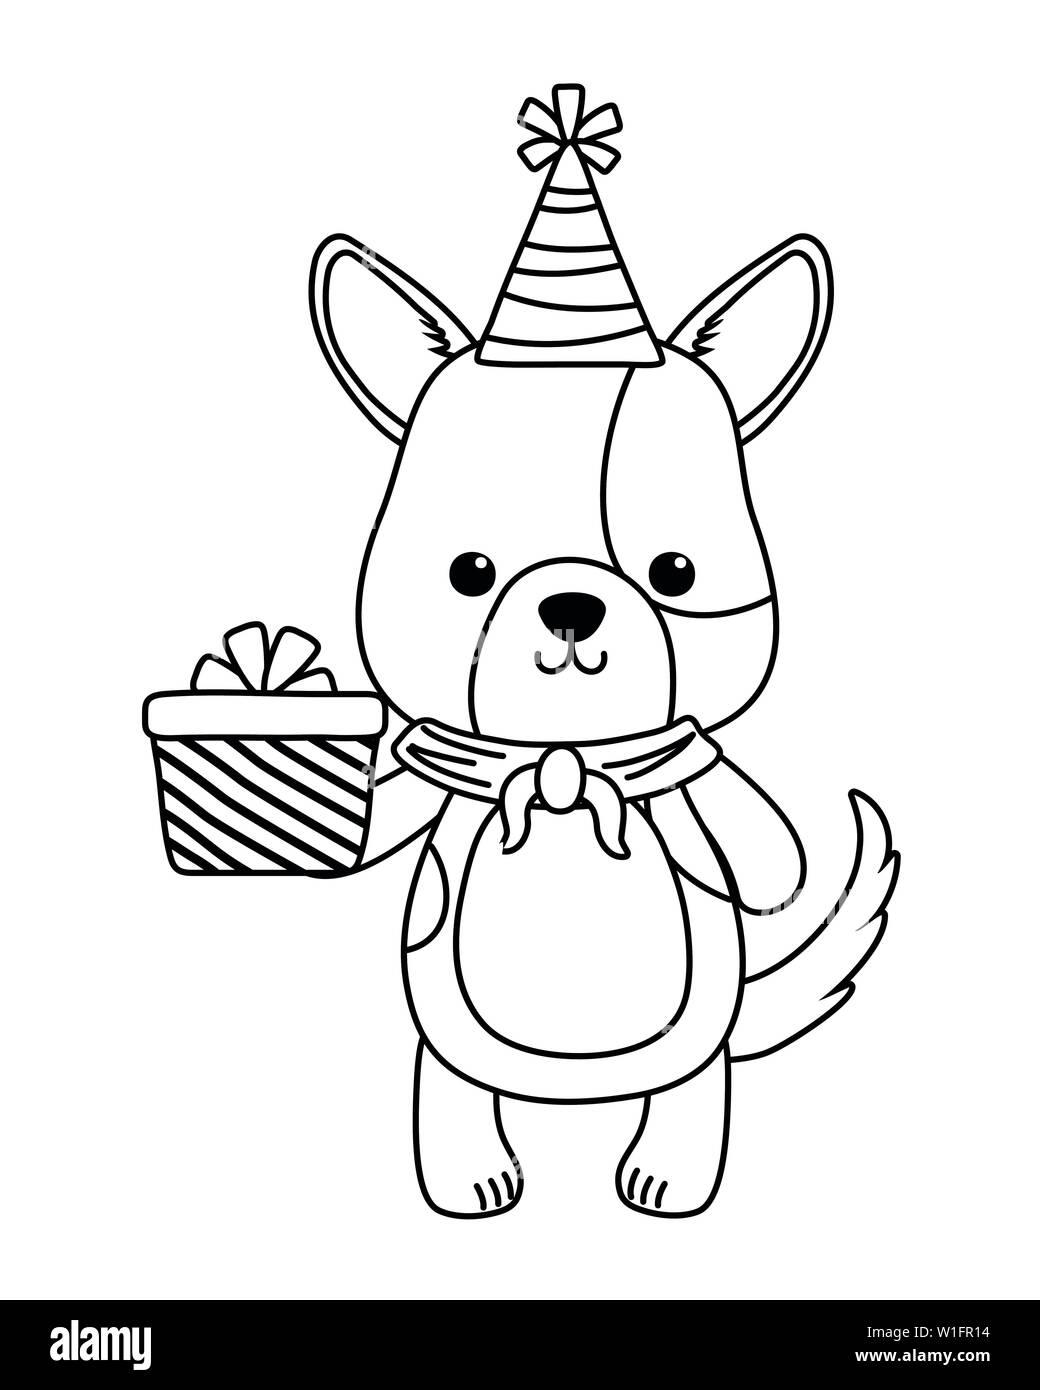 Dog Cartoon Design Animal Happy Birthday Celebration Decoration And Surprise Theme Vector Illustration Stock Vector Image Art Alamy